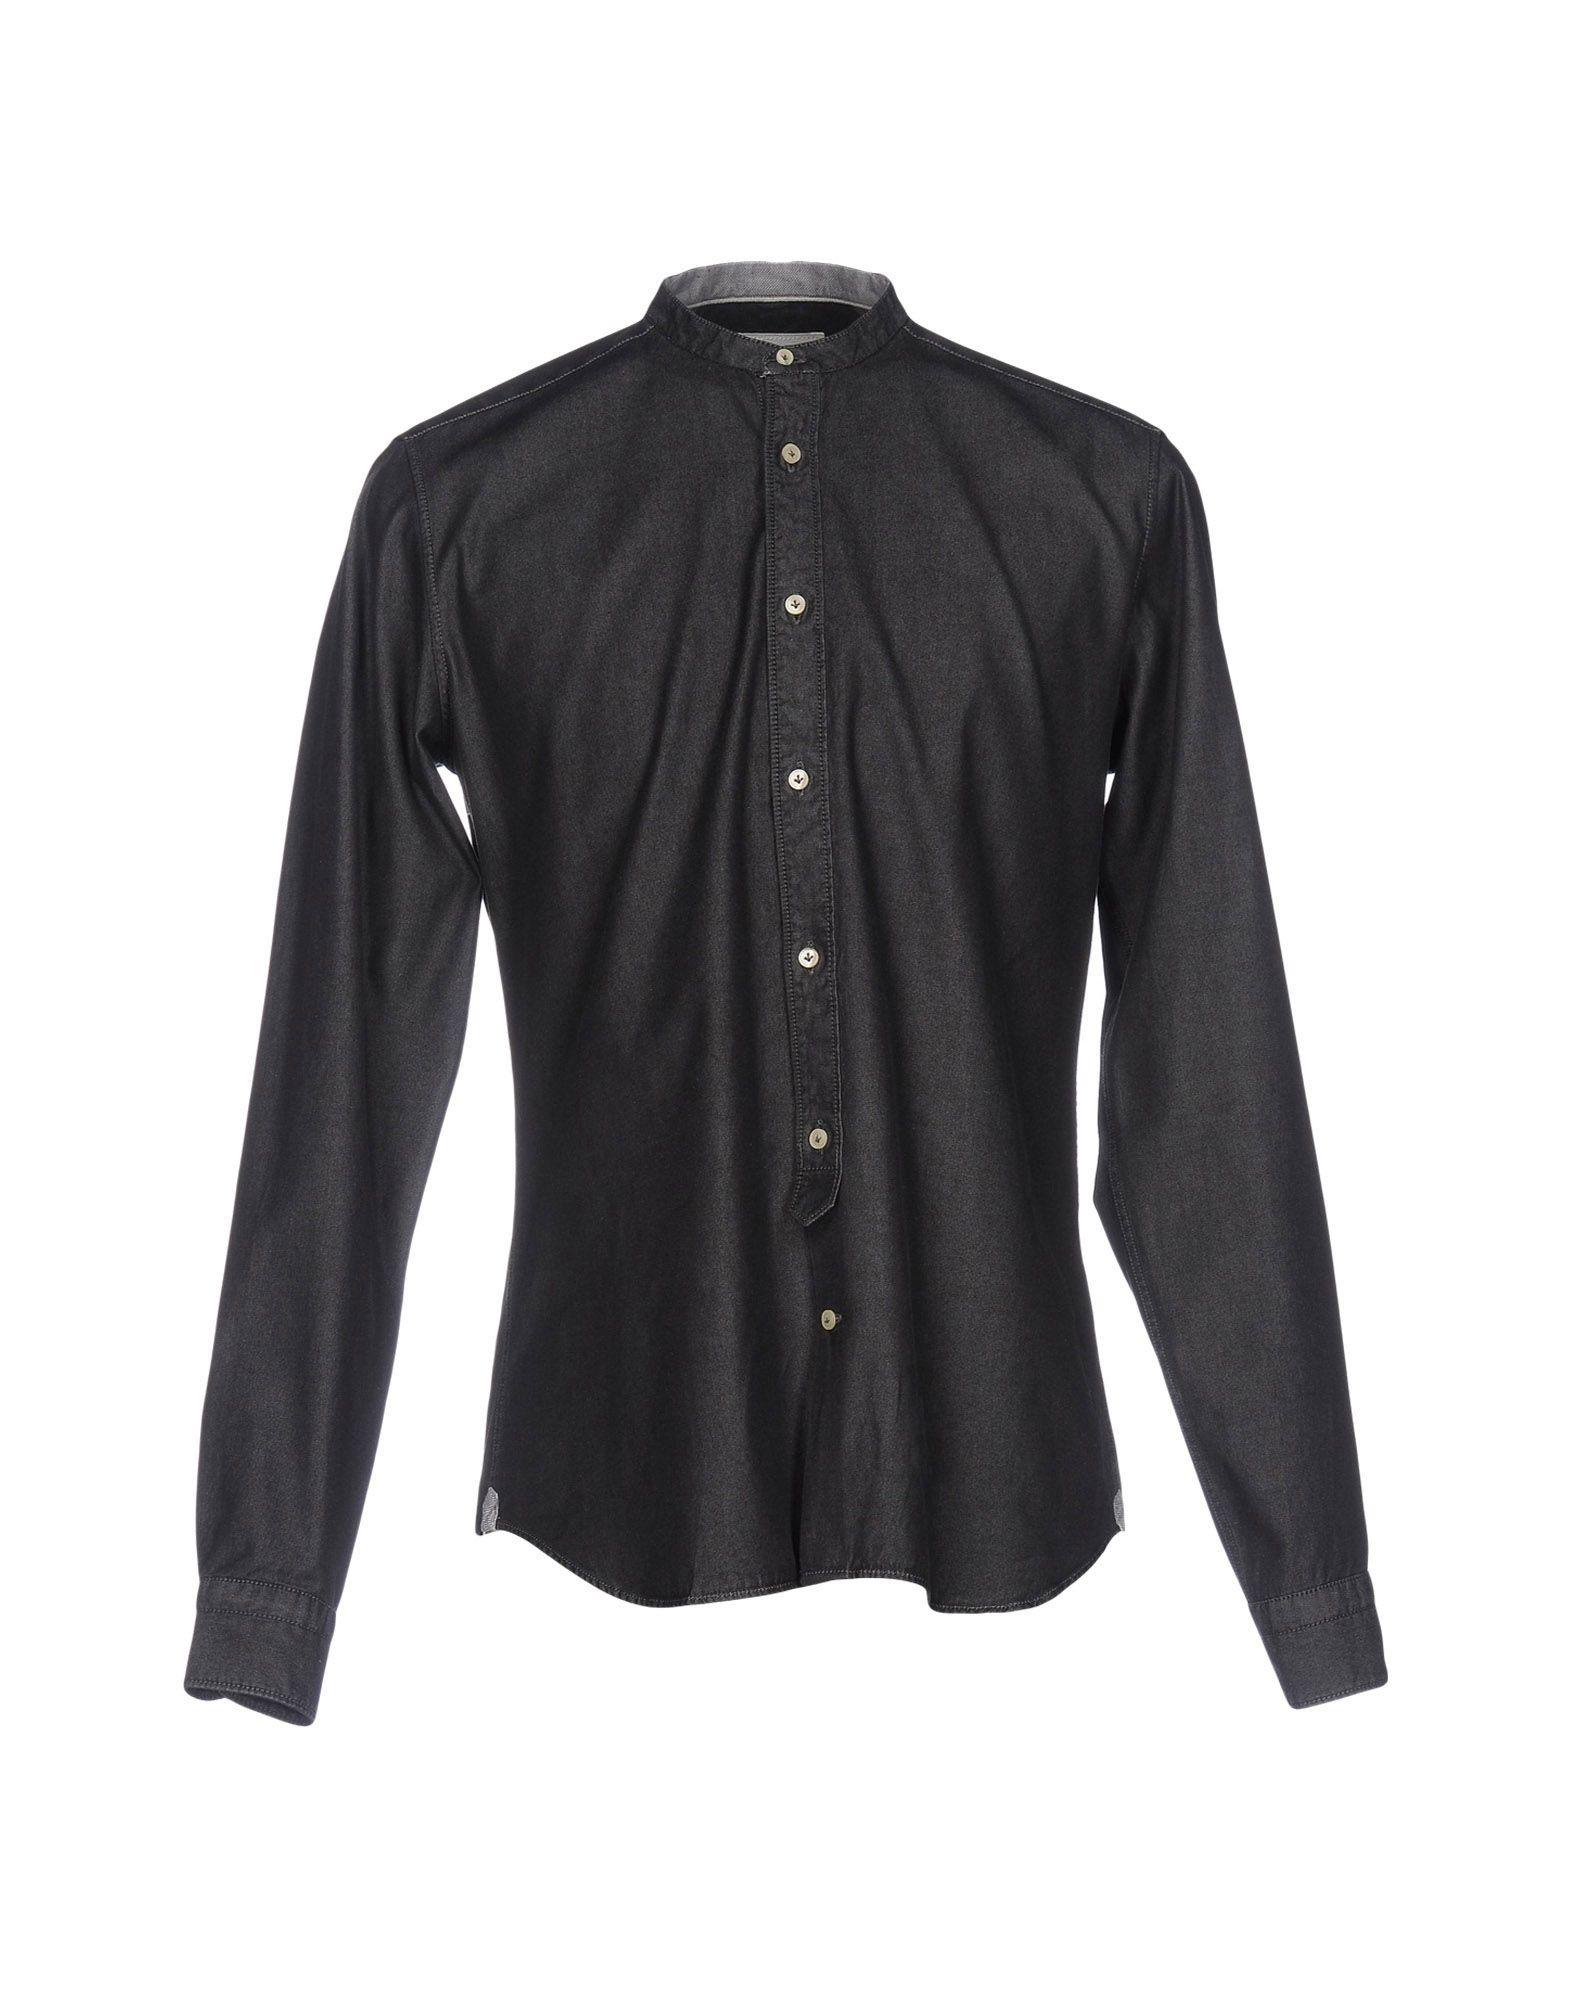 TINTORIA MATTEI 954 Джинсовая рубашка rtm870t 954